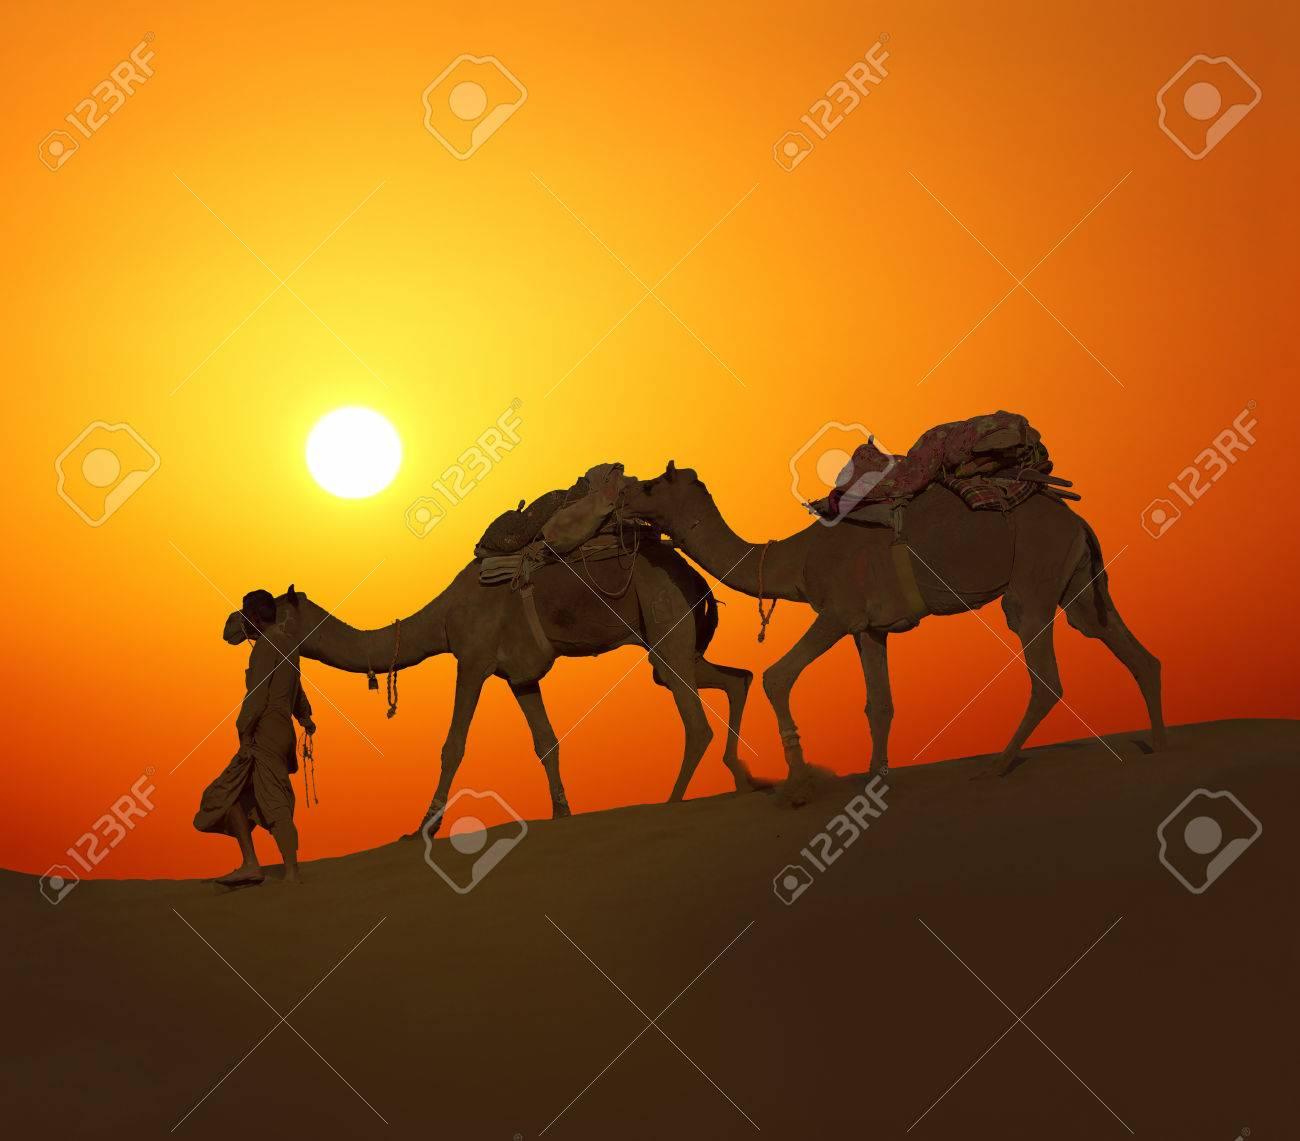 cameleer leading caravan of camels in desert - silhouette against sunset - 26095527